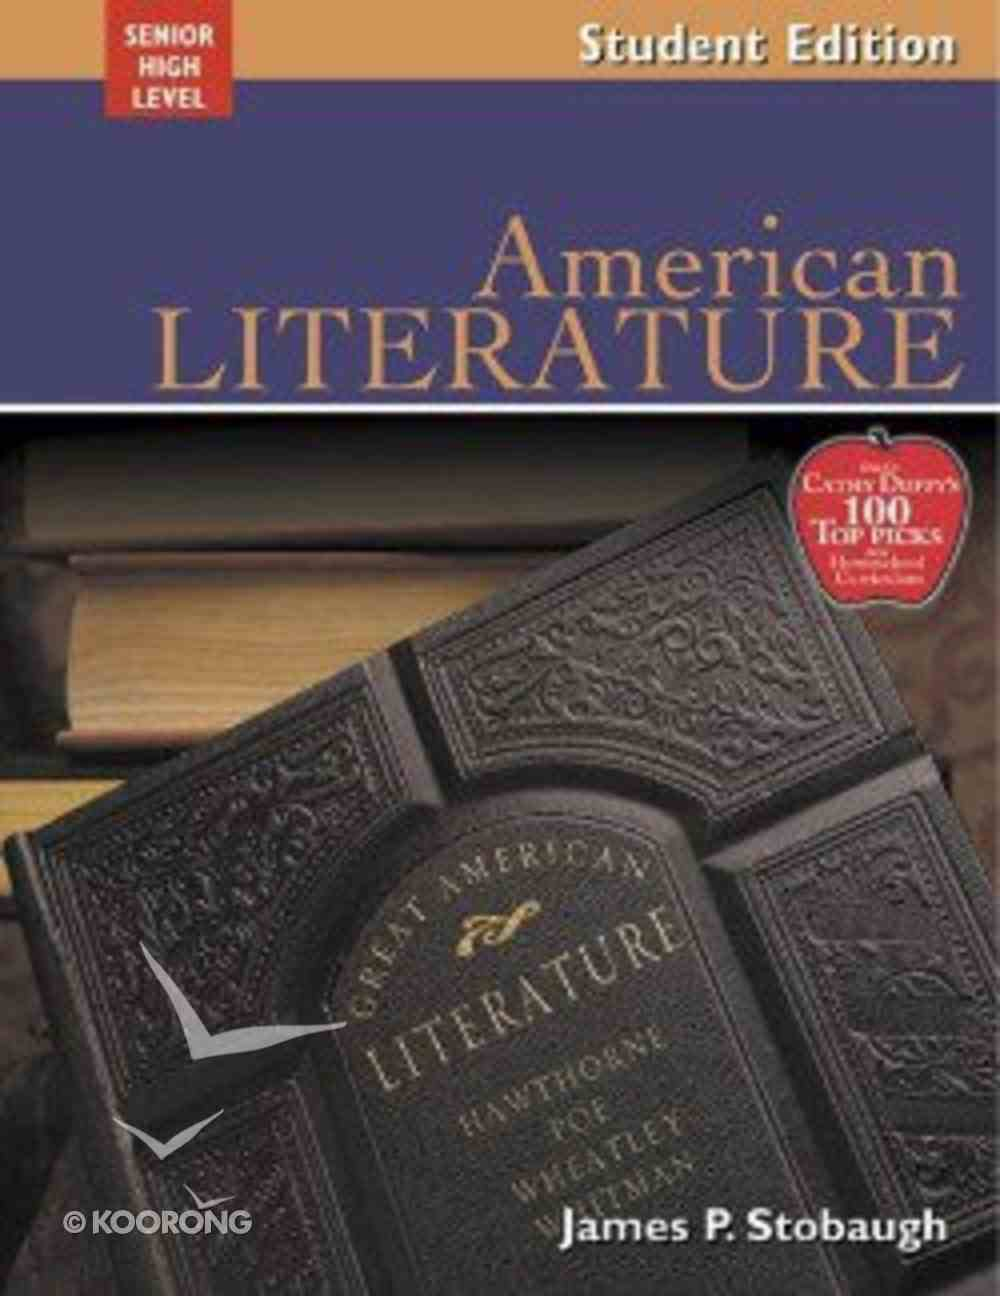 American Literature Student Edition (Senior High Level) Paperback